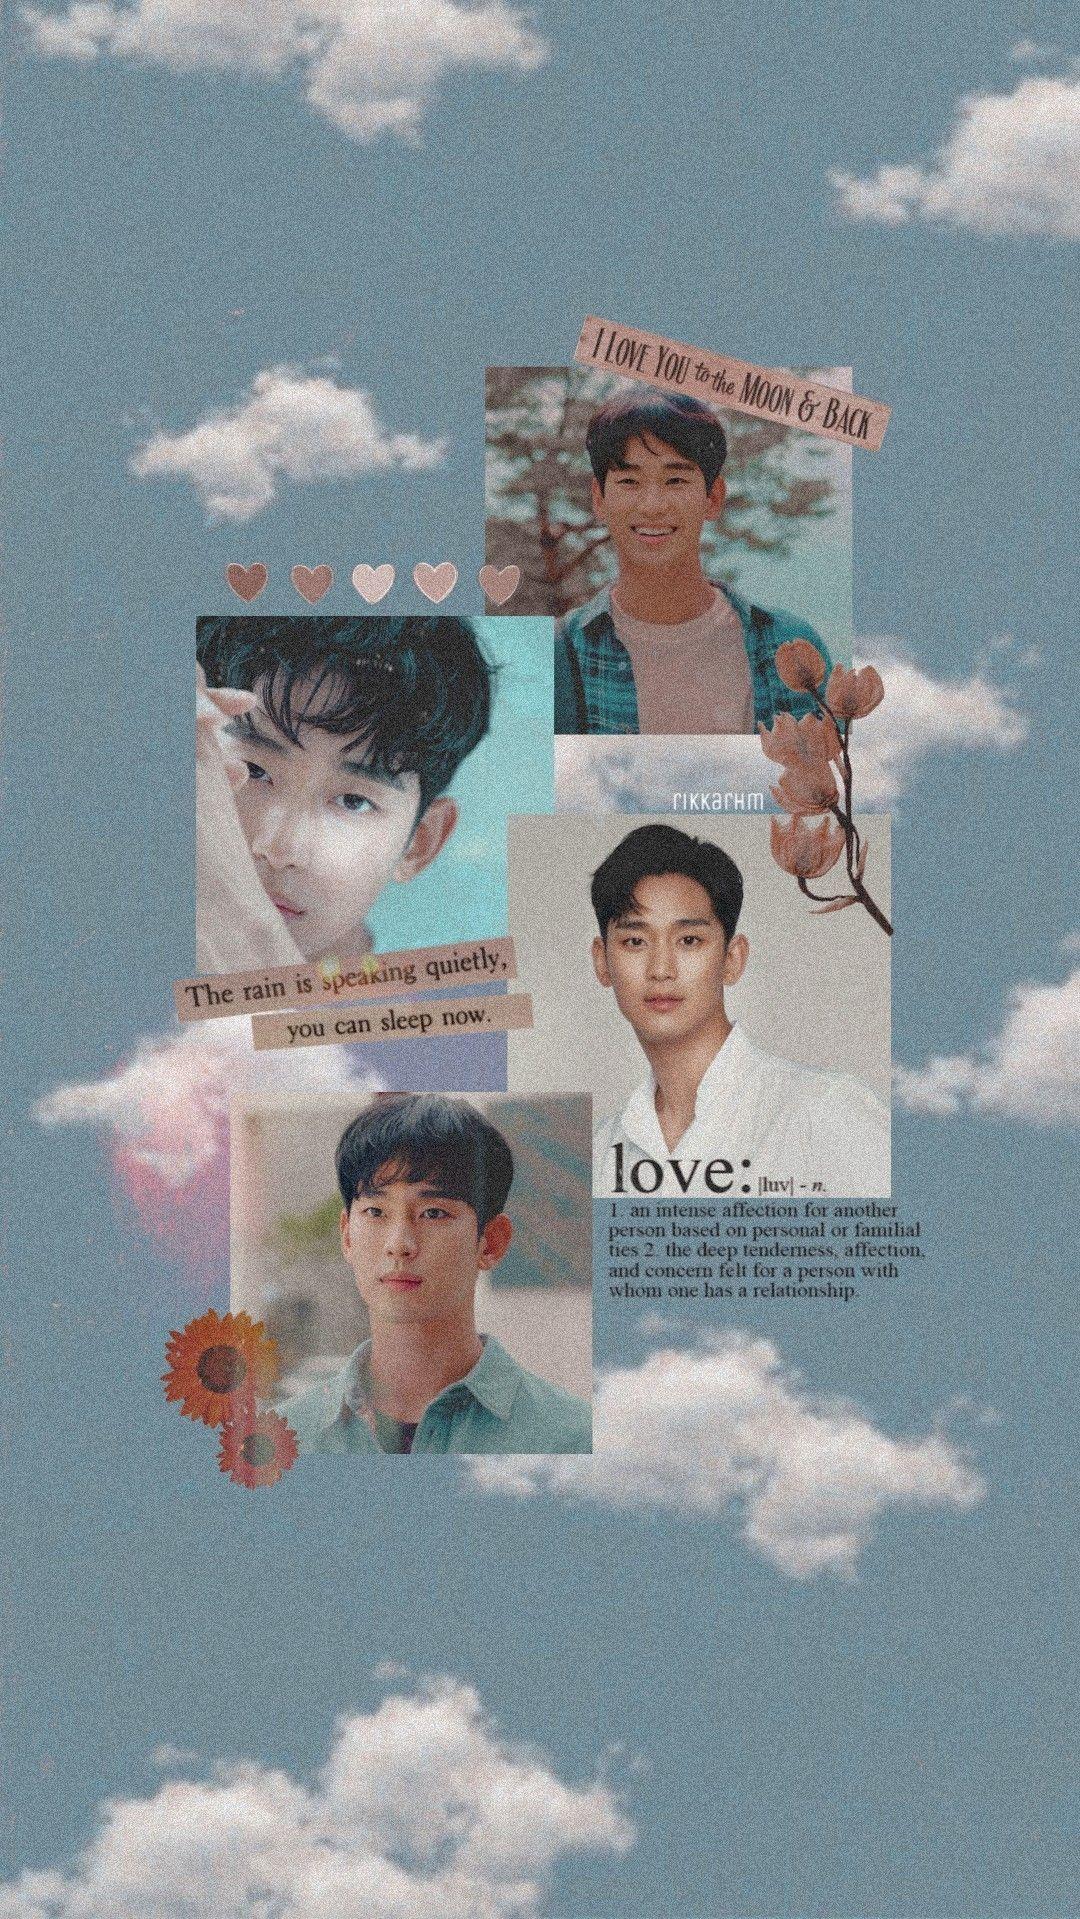 Kim Soo Hyun Aesthetic Vintage Wallpaper Aktor Korea Gambar Kim Soo Hyun